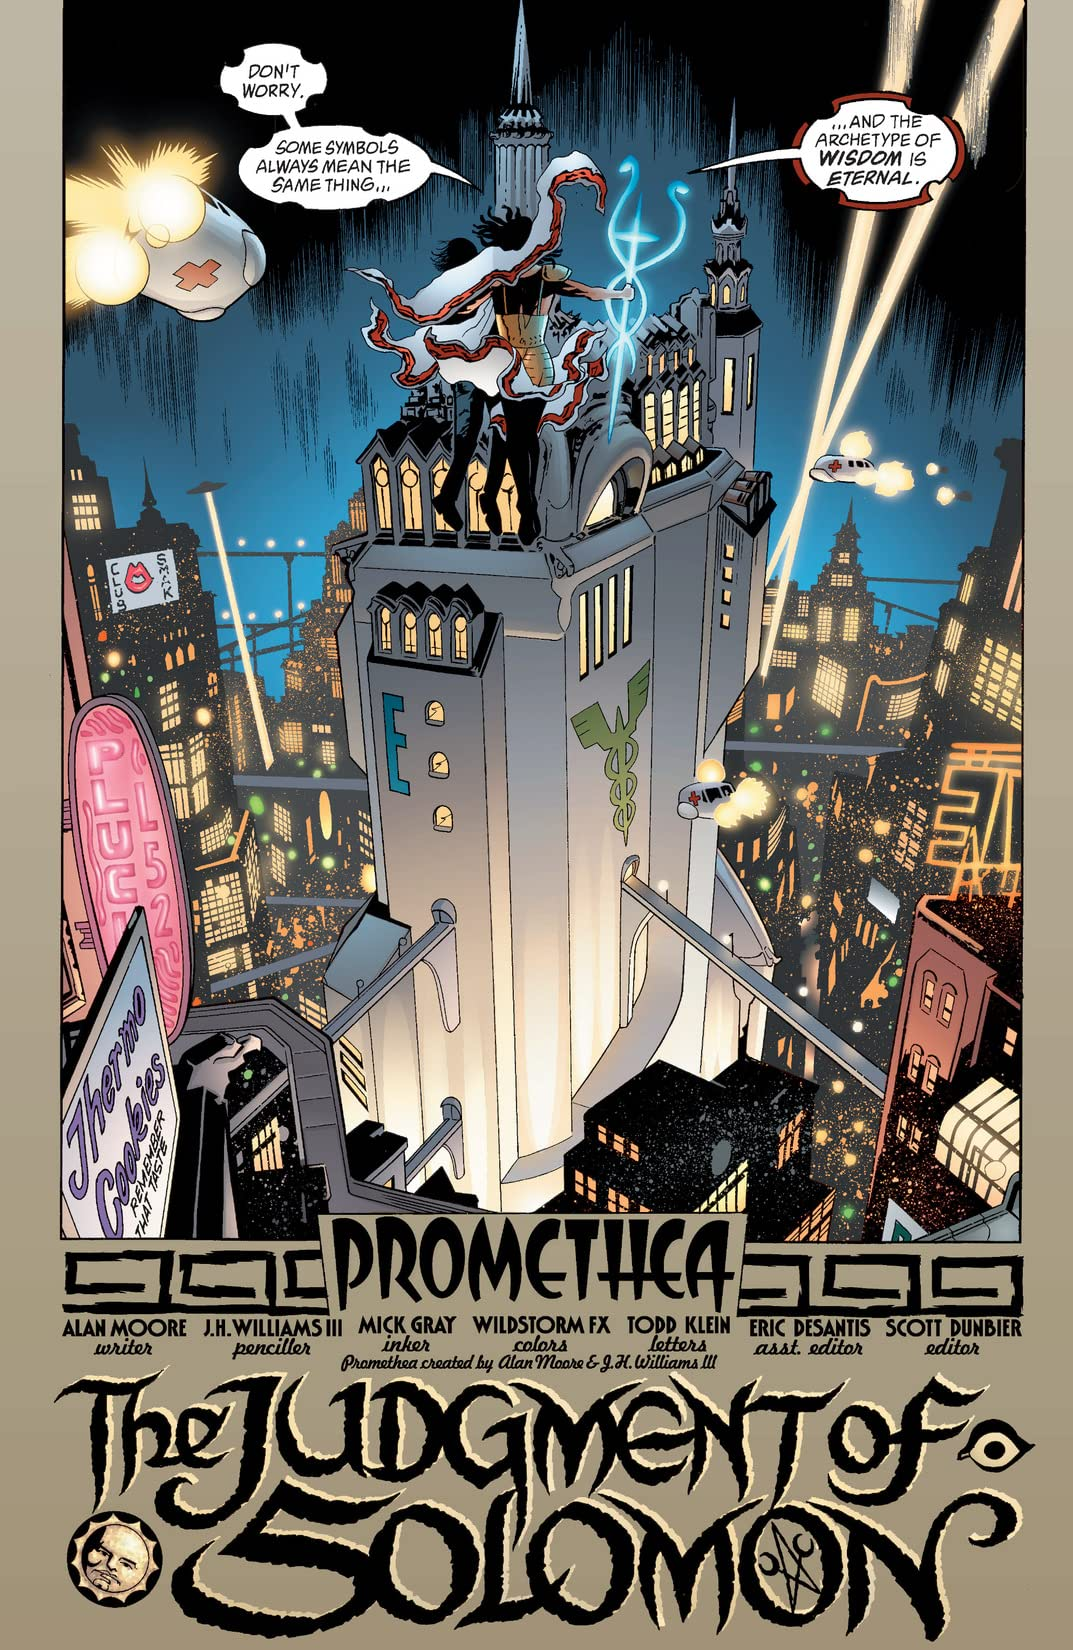 Promethea #2